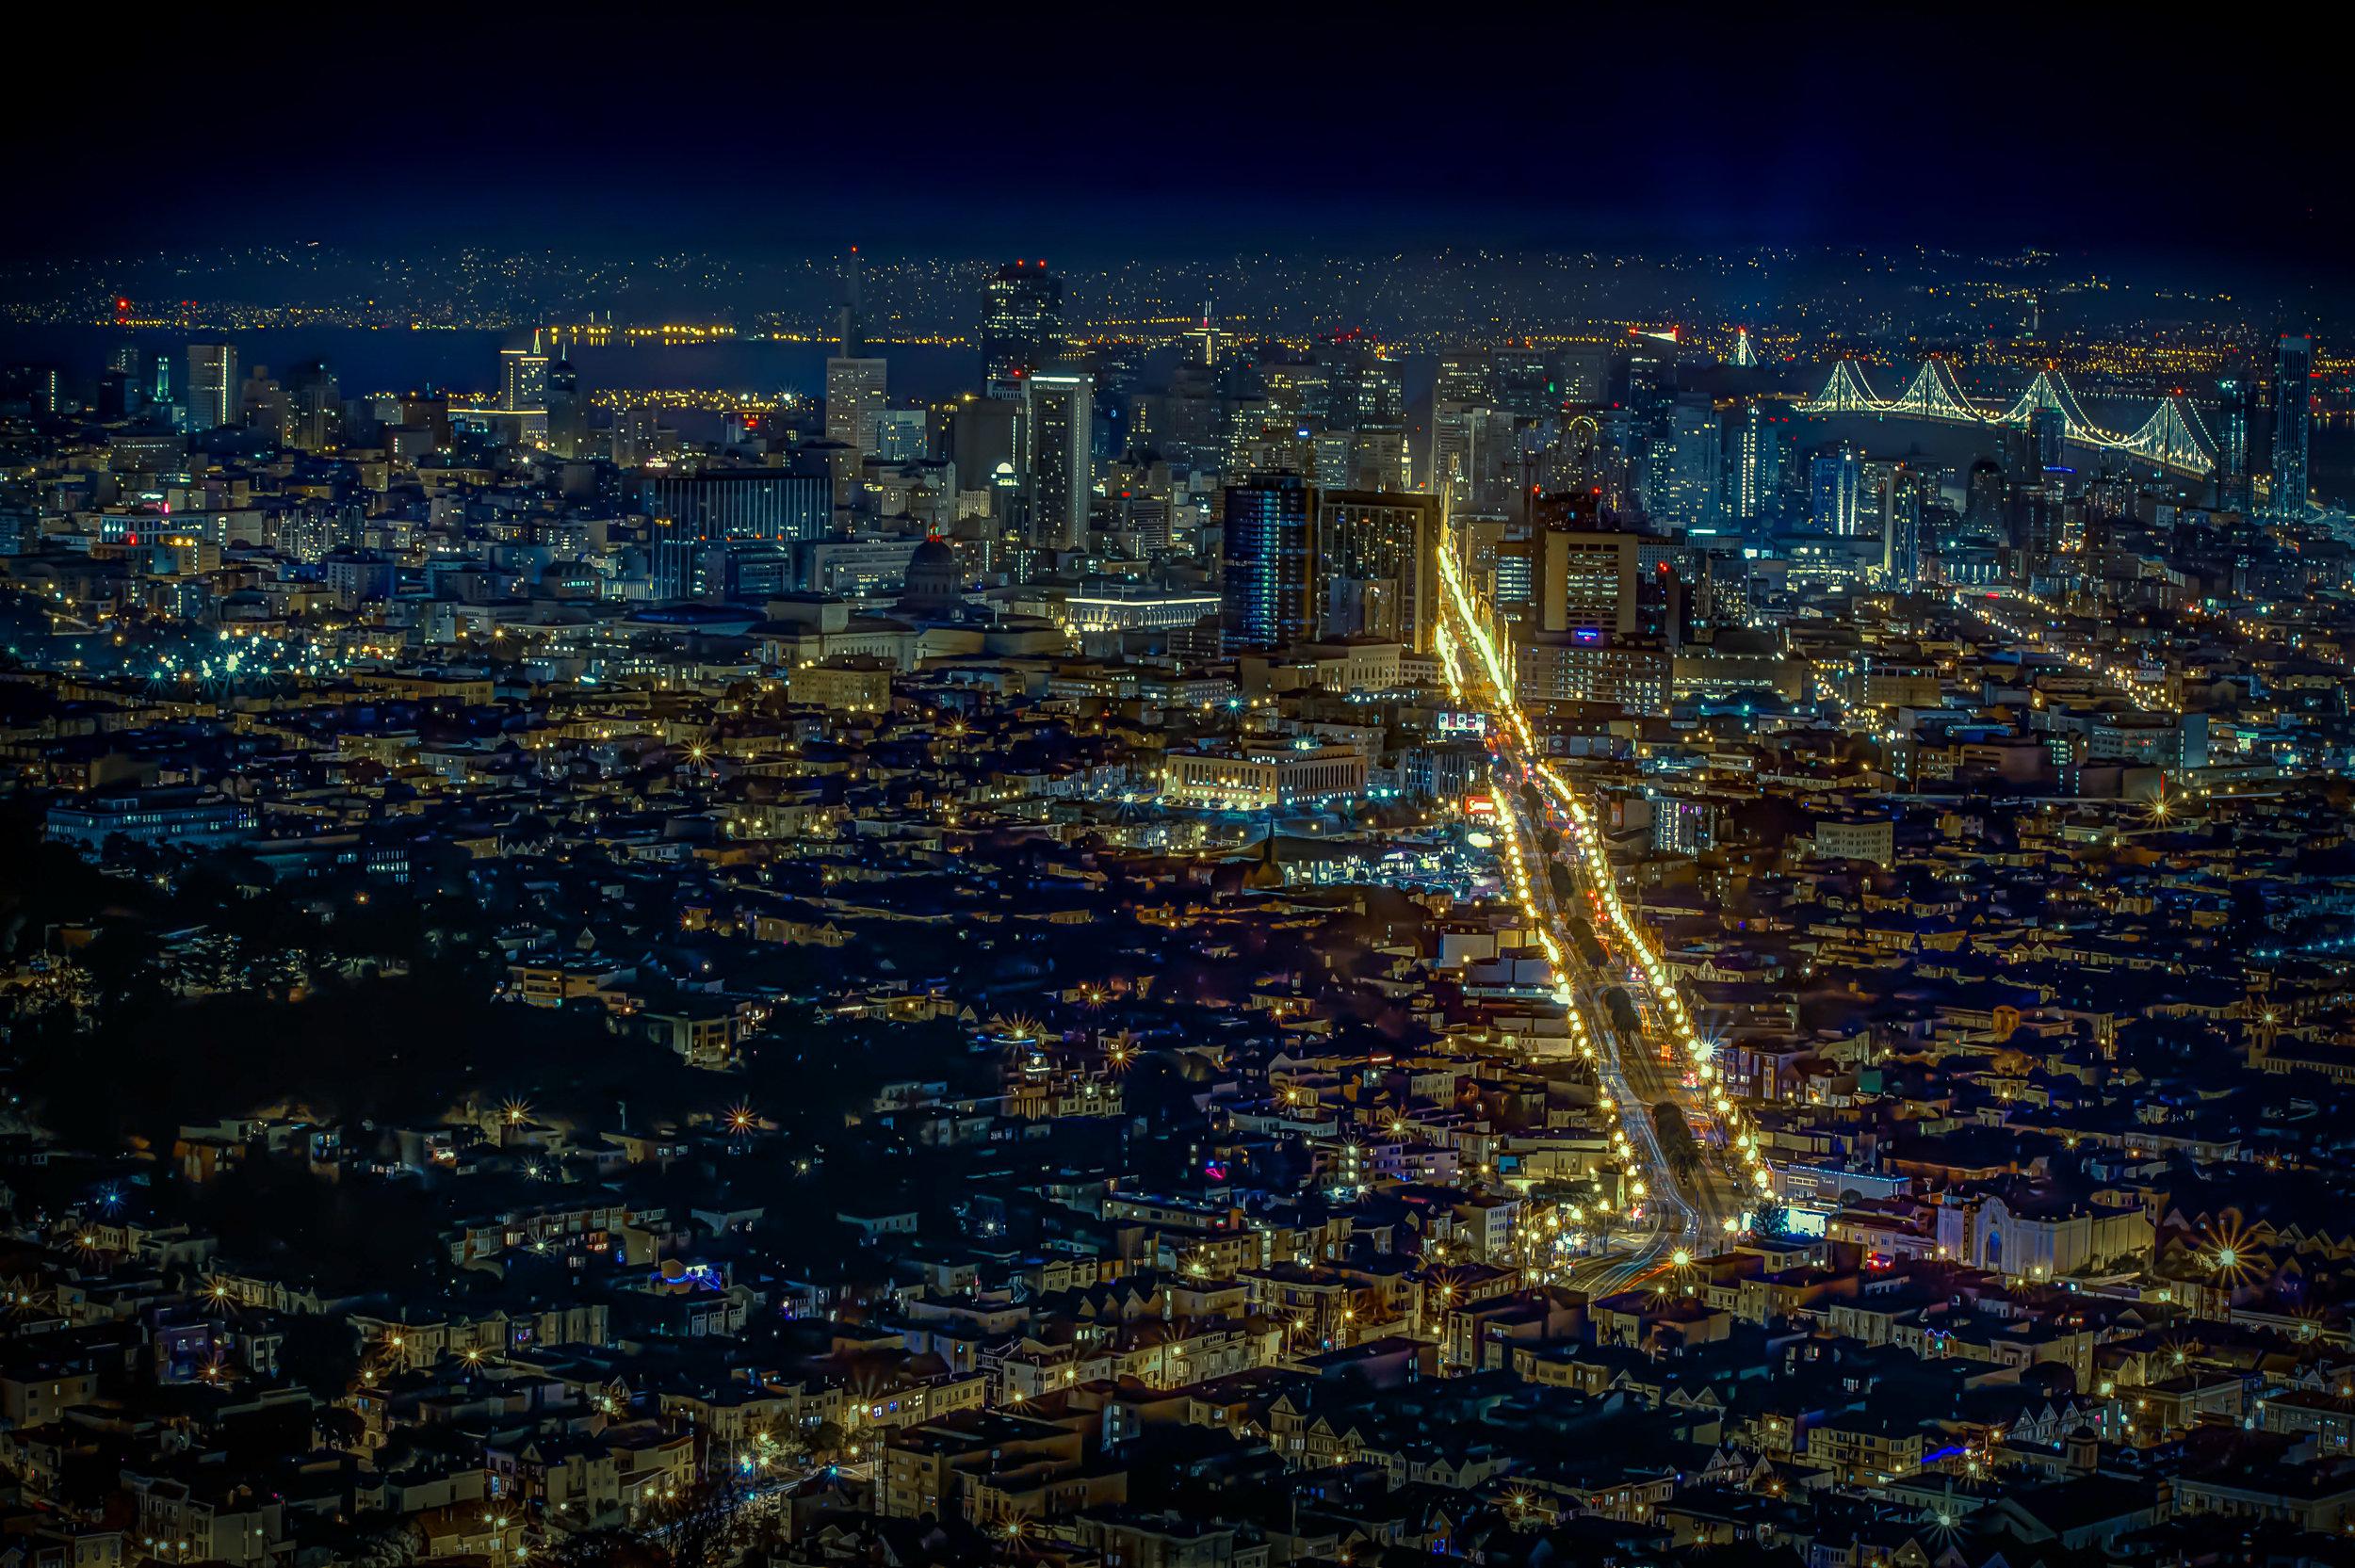 Nightlife in San Francisco